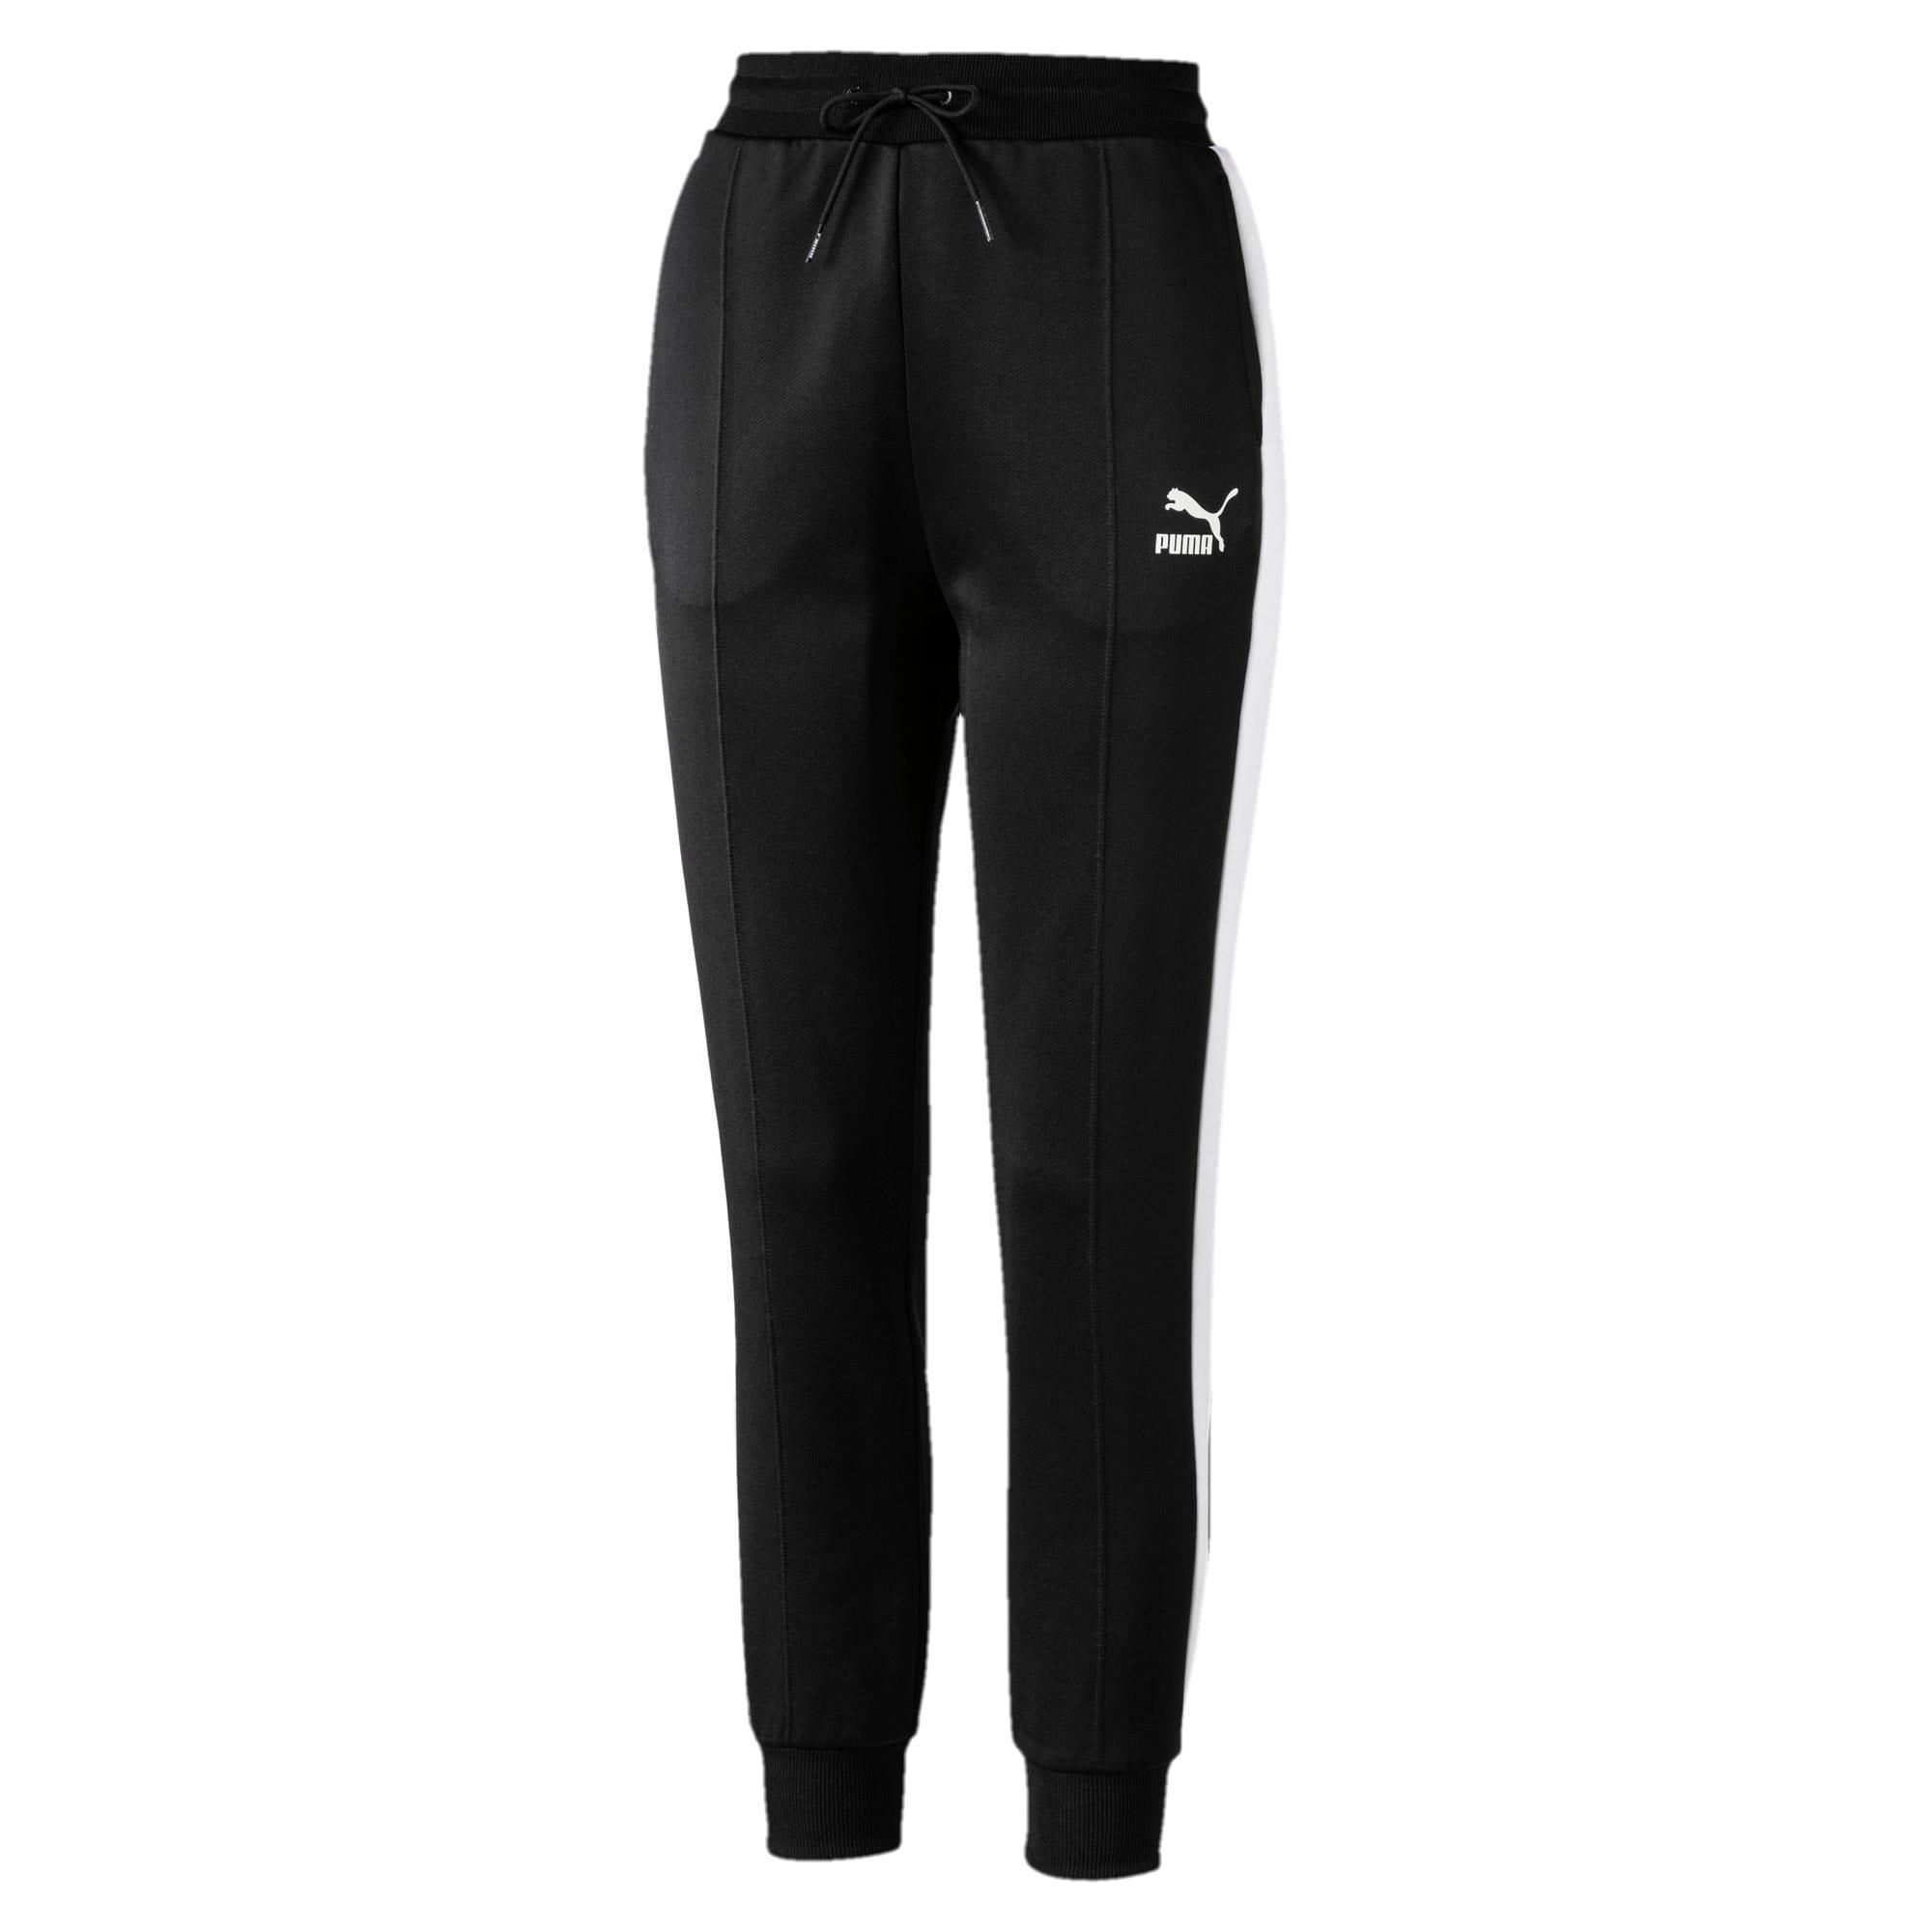 Thumbnail 4 of Classics T7 Knitted Women's Track Pants, Puma Black, medium